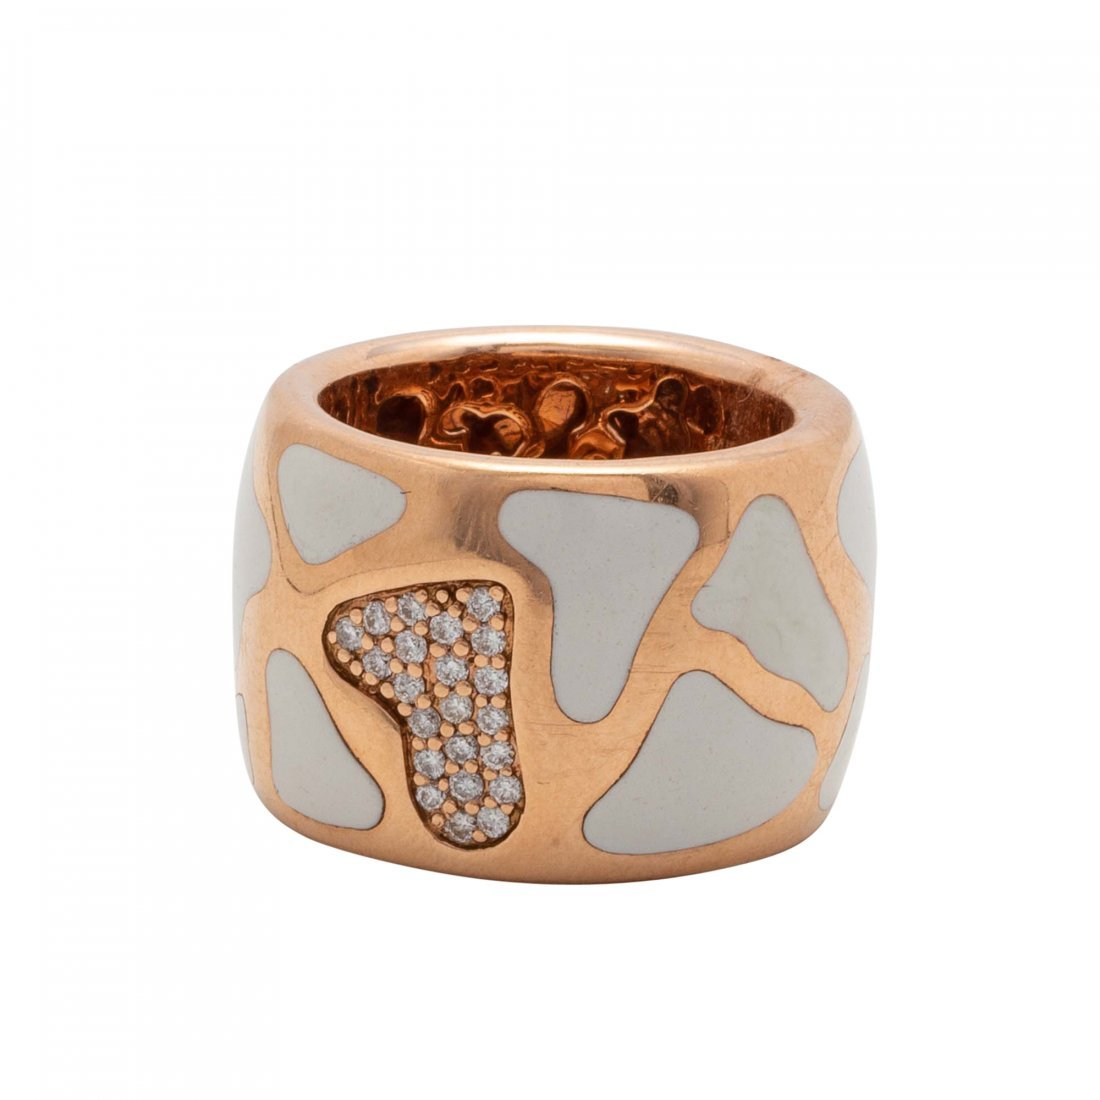 Gold, Enamel and Diamond Ring